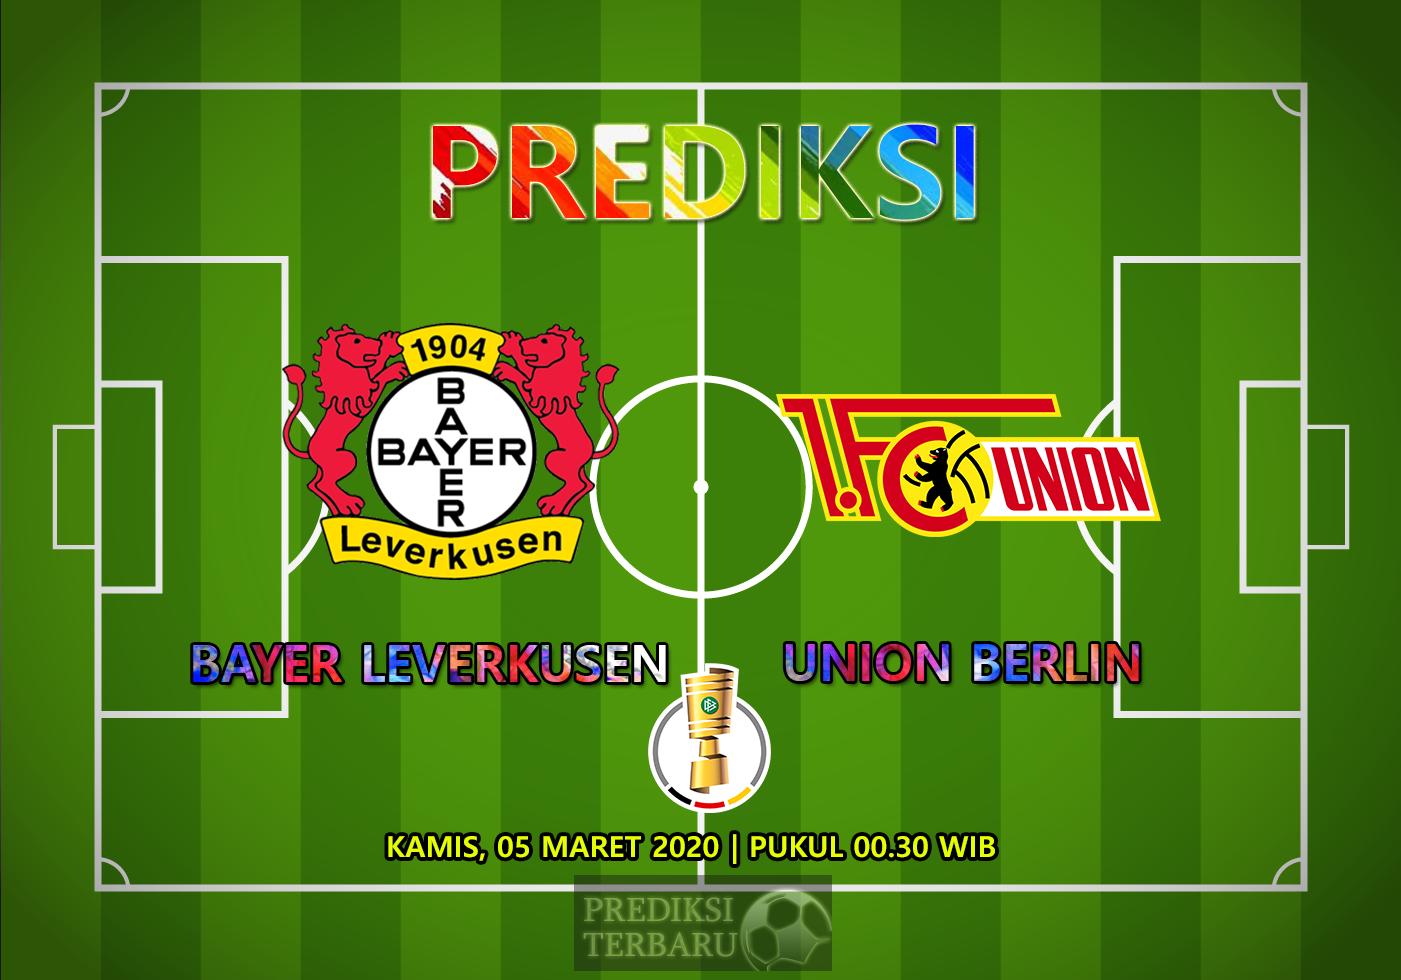 Prediksi Bayer Leverkusen Vs Union Berlin Kamis 05 Maret